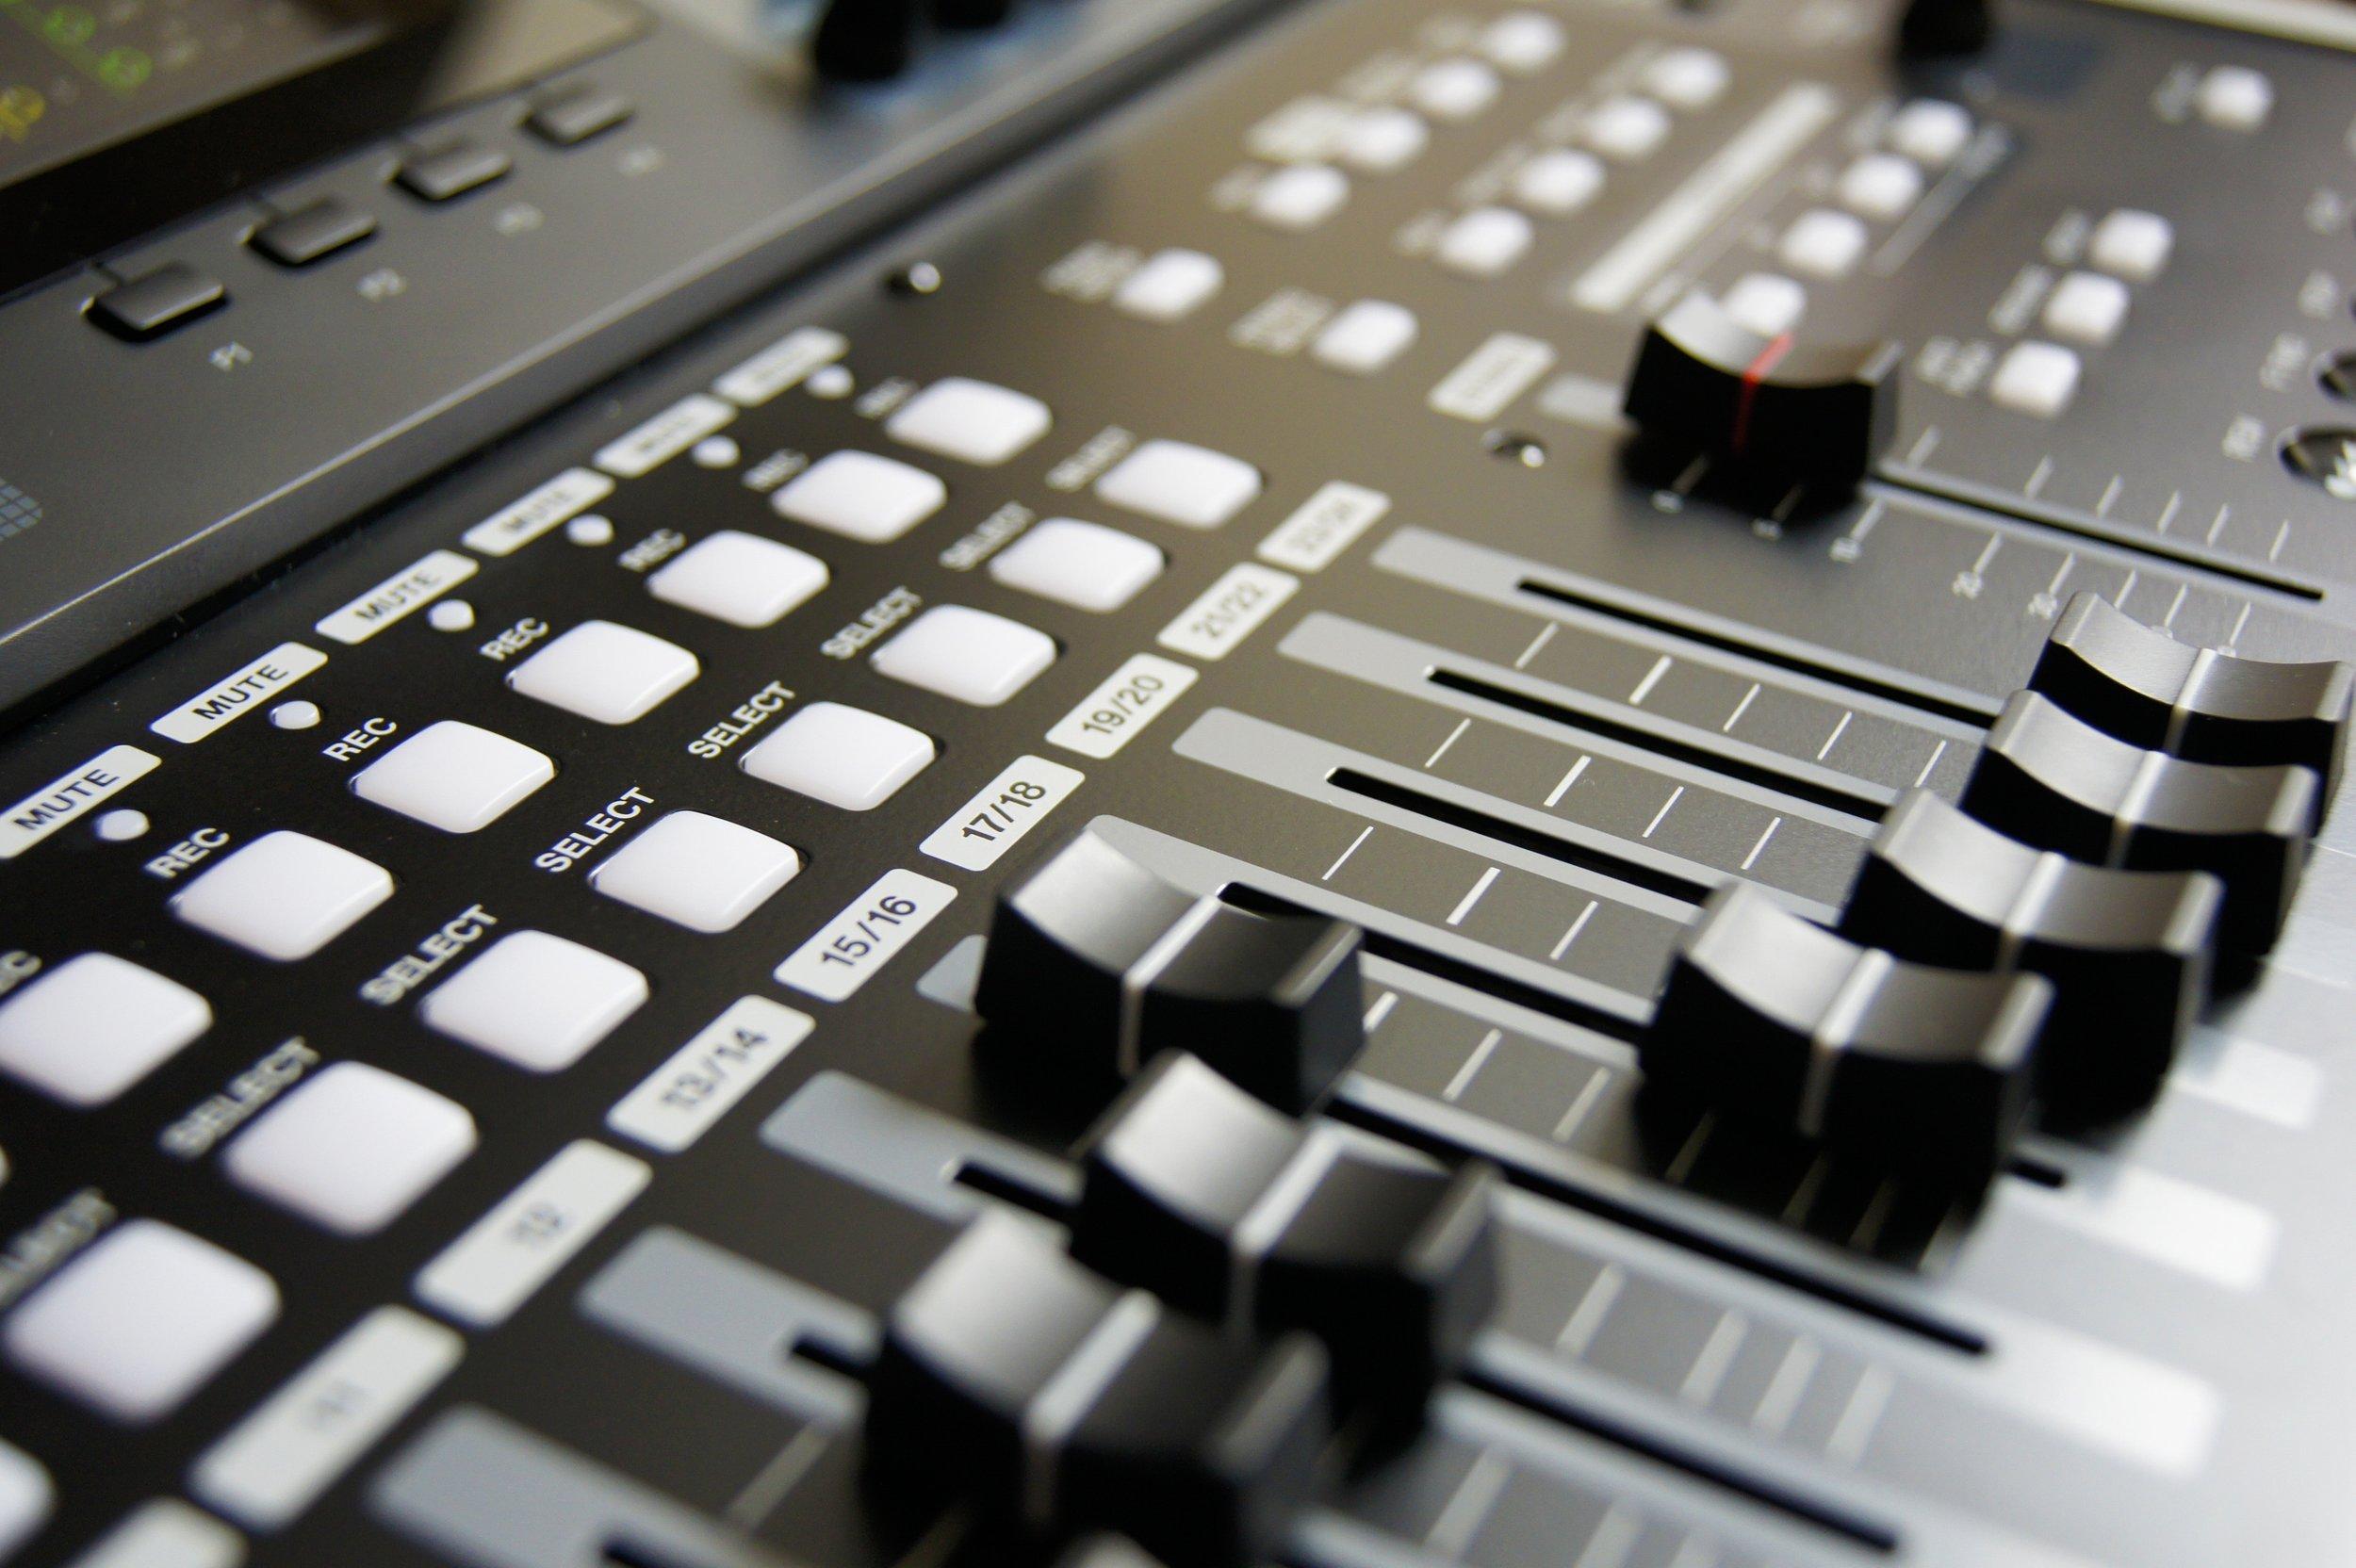 audio-mixer-buttons-close-up-159206.jpg